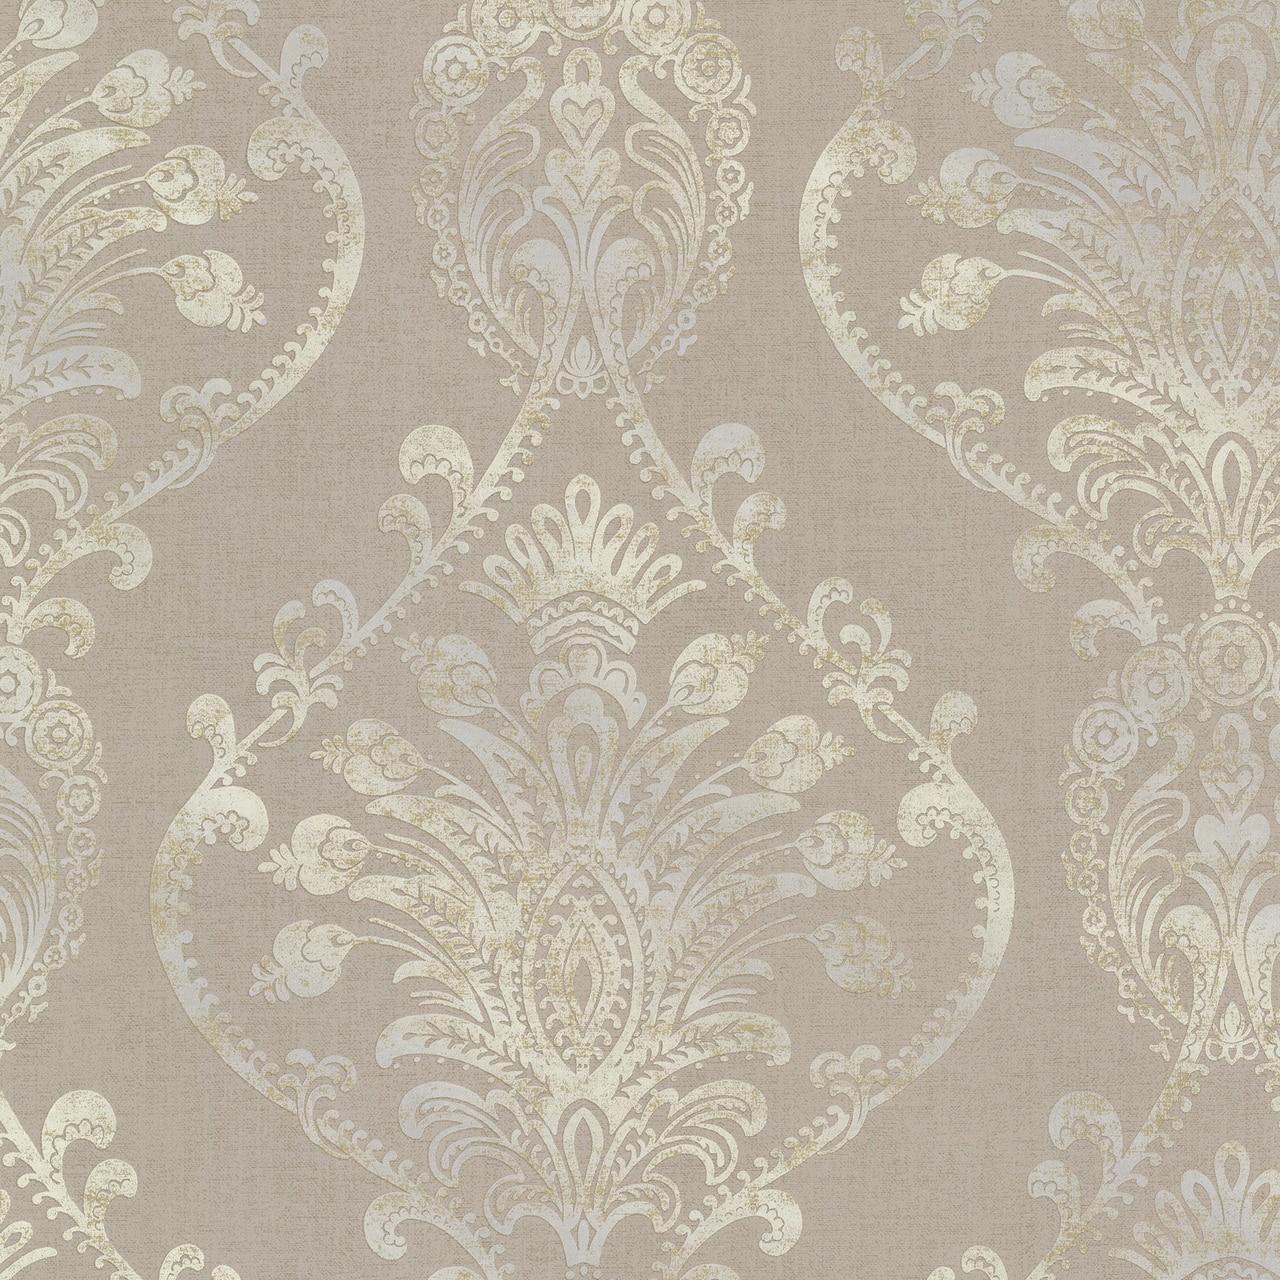 Brewster 2665 21458 Avalon Noble Taupe Ornate Damask Wallpaper 1280x1280